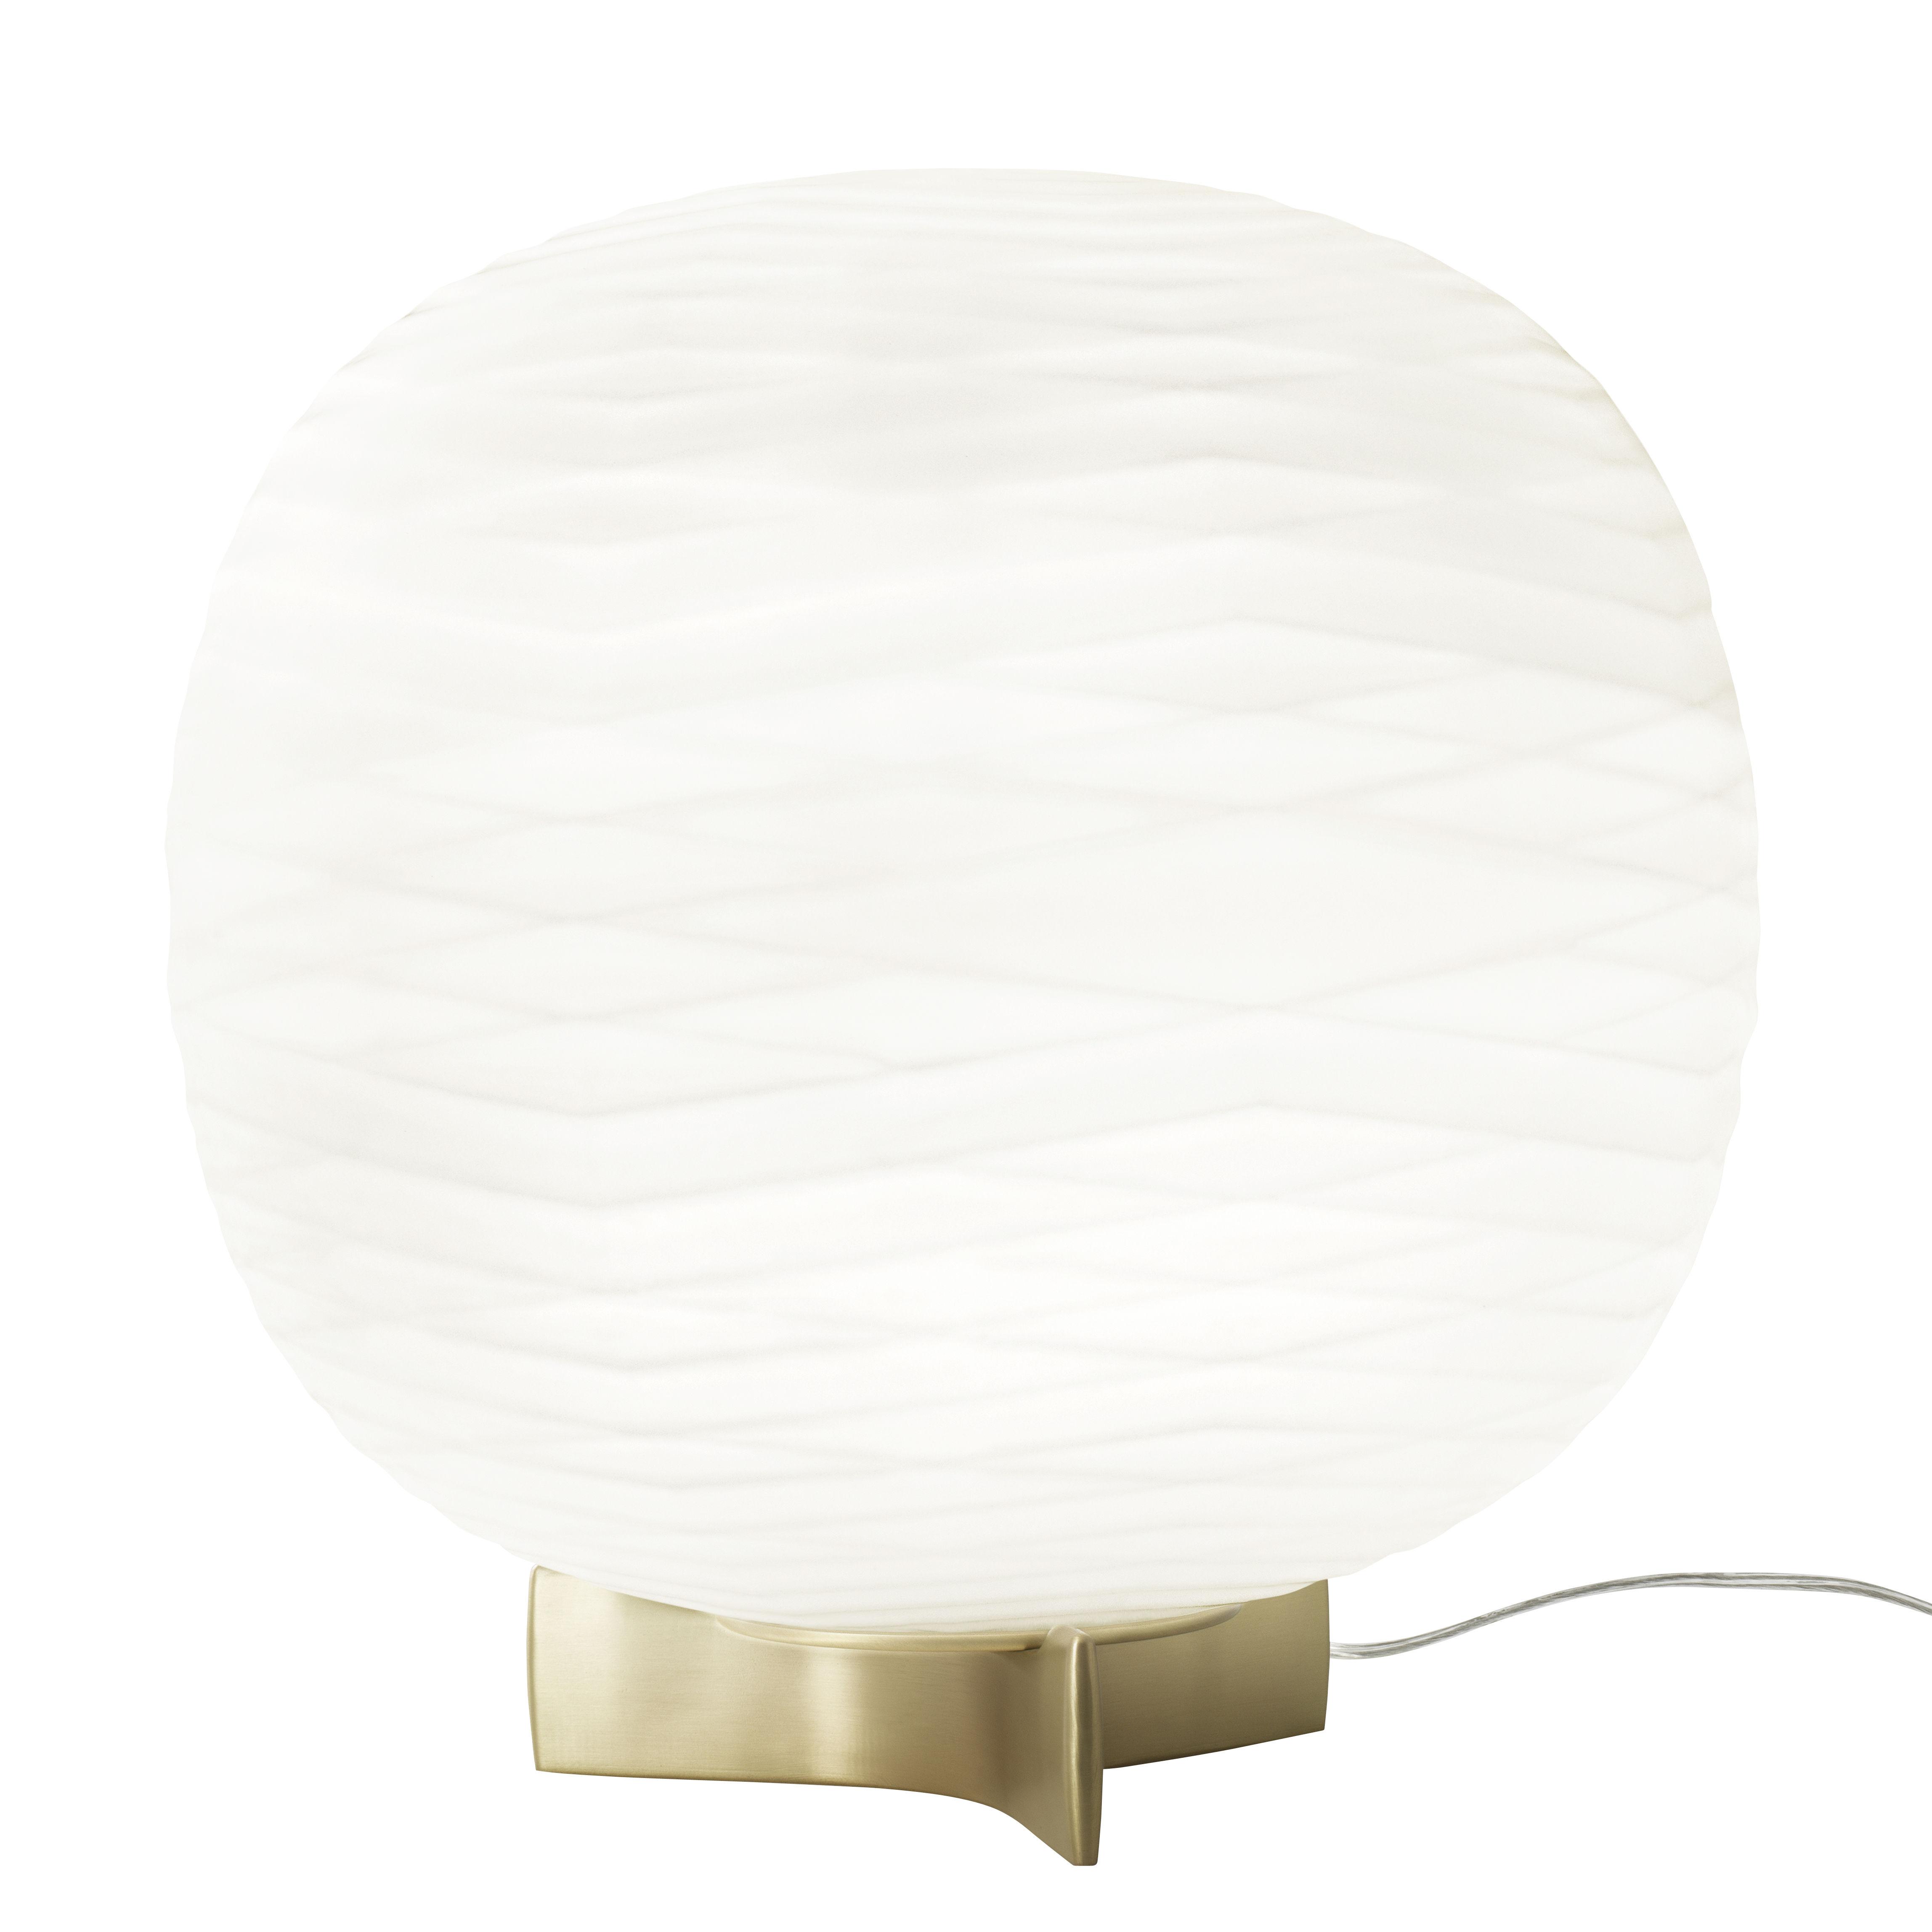 Lighting - Table Lamps - Gem Table lamp - / Blown glass by Foscarini - White / Gold - Aluminium, Blown glass